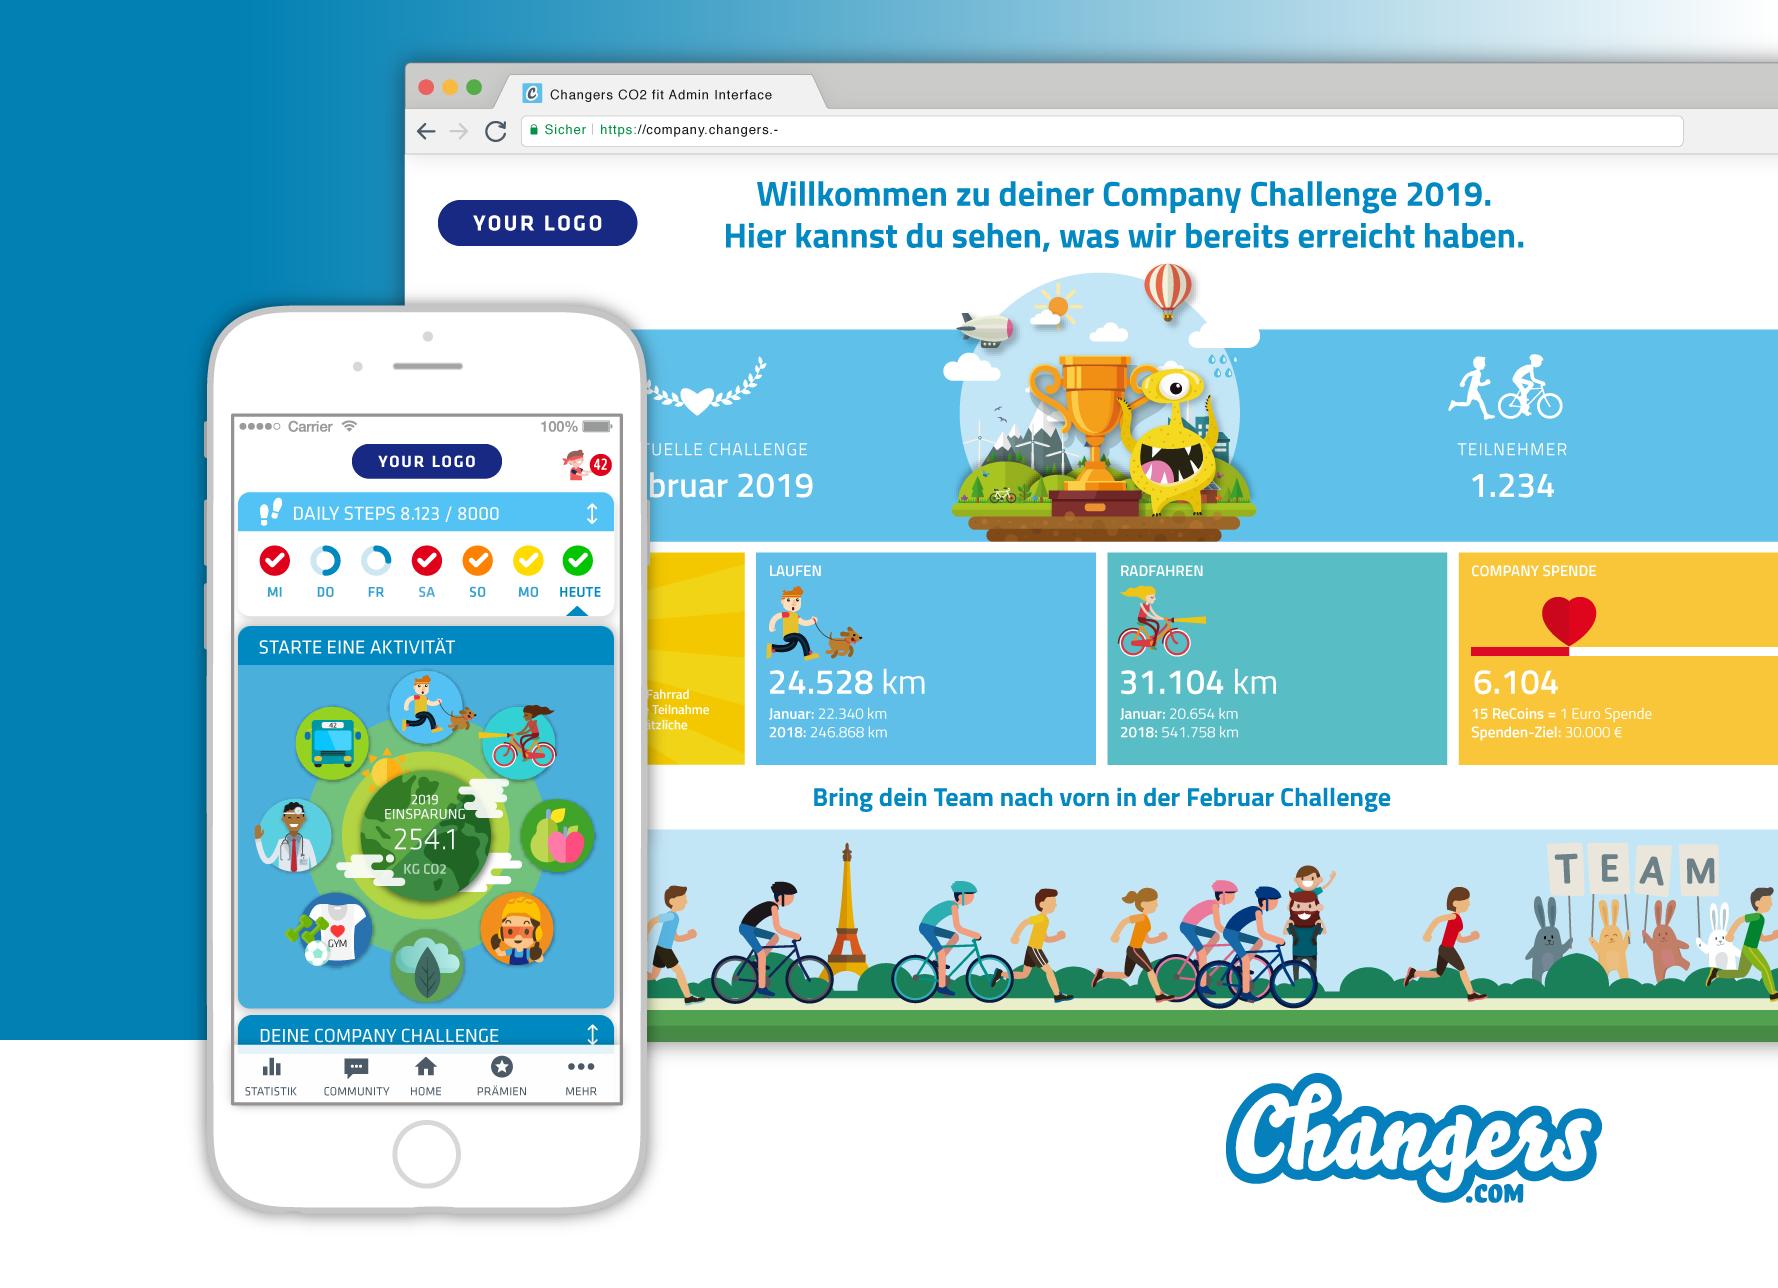 Webseite Changers.com